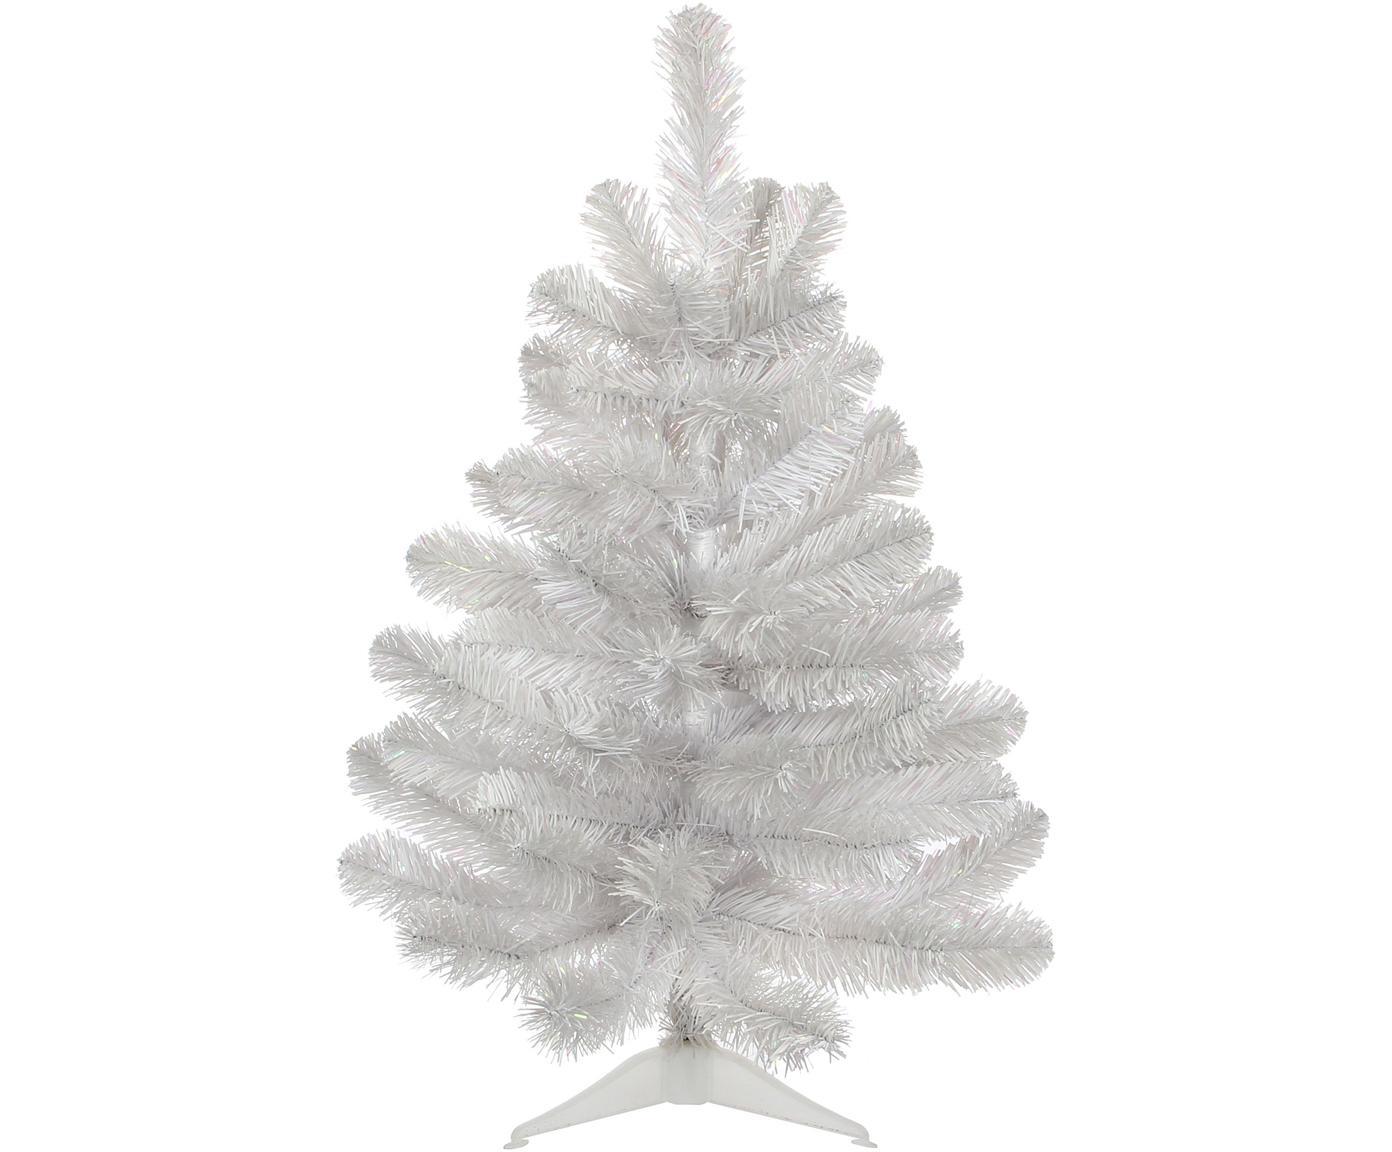 Albero di Natale artificiale Icelandic, Materiale sintetico (PVC), Bianco iridescente, Ø 46 x Alt. 60 cm